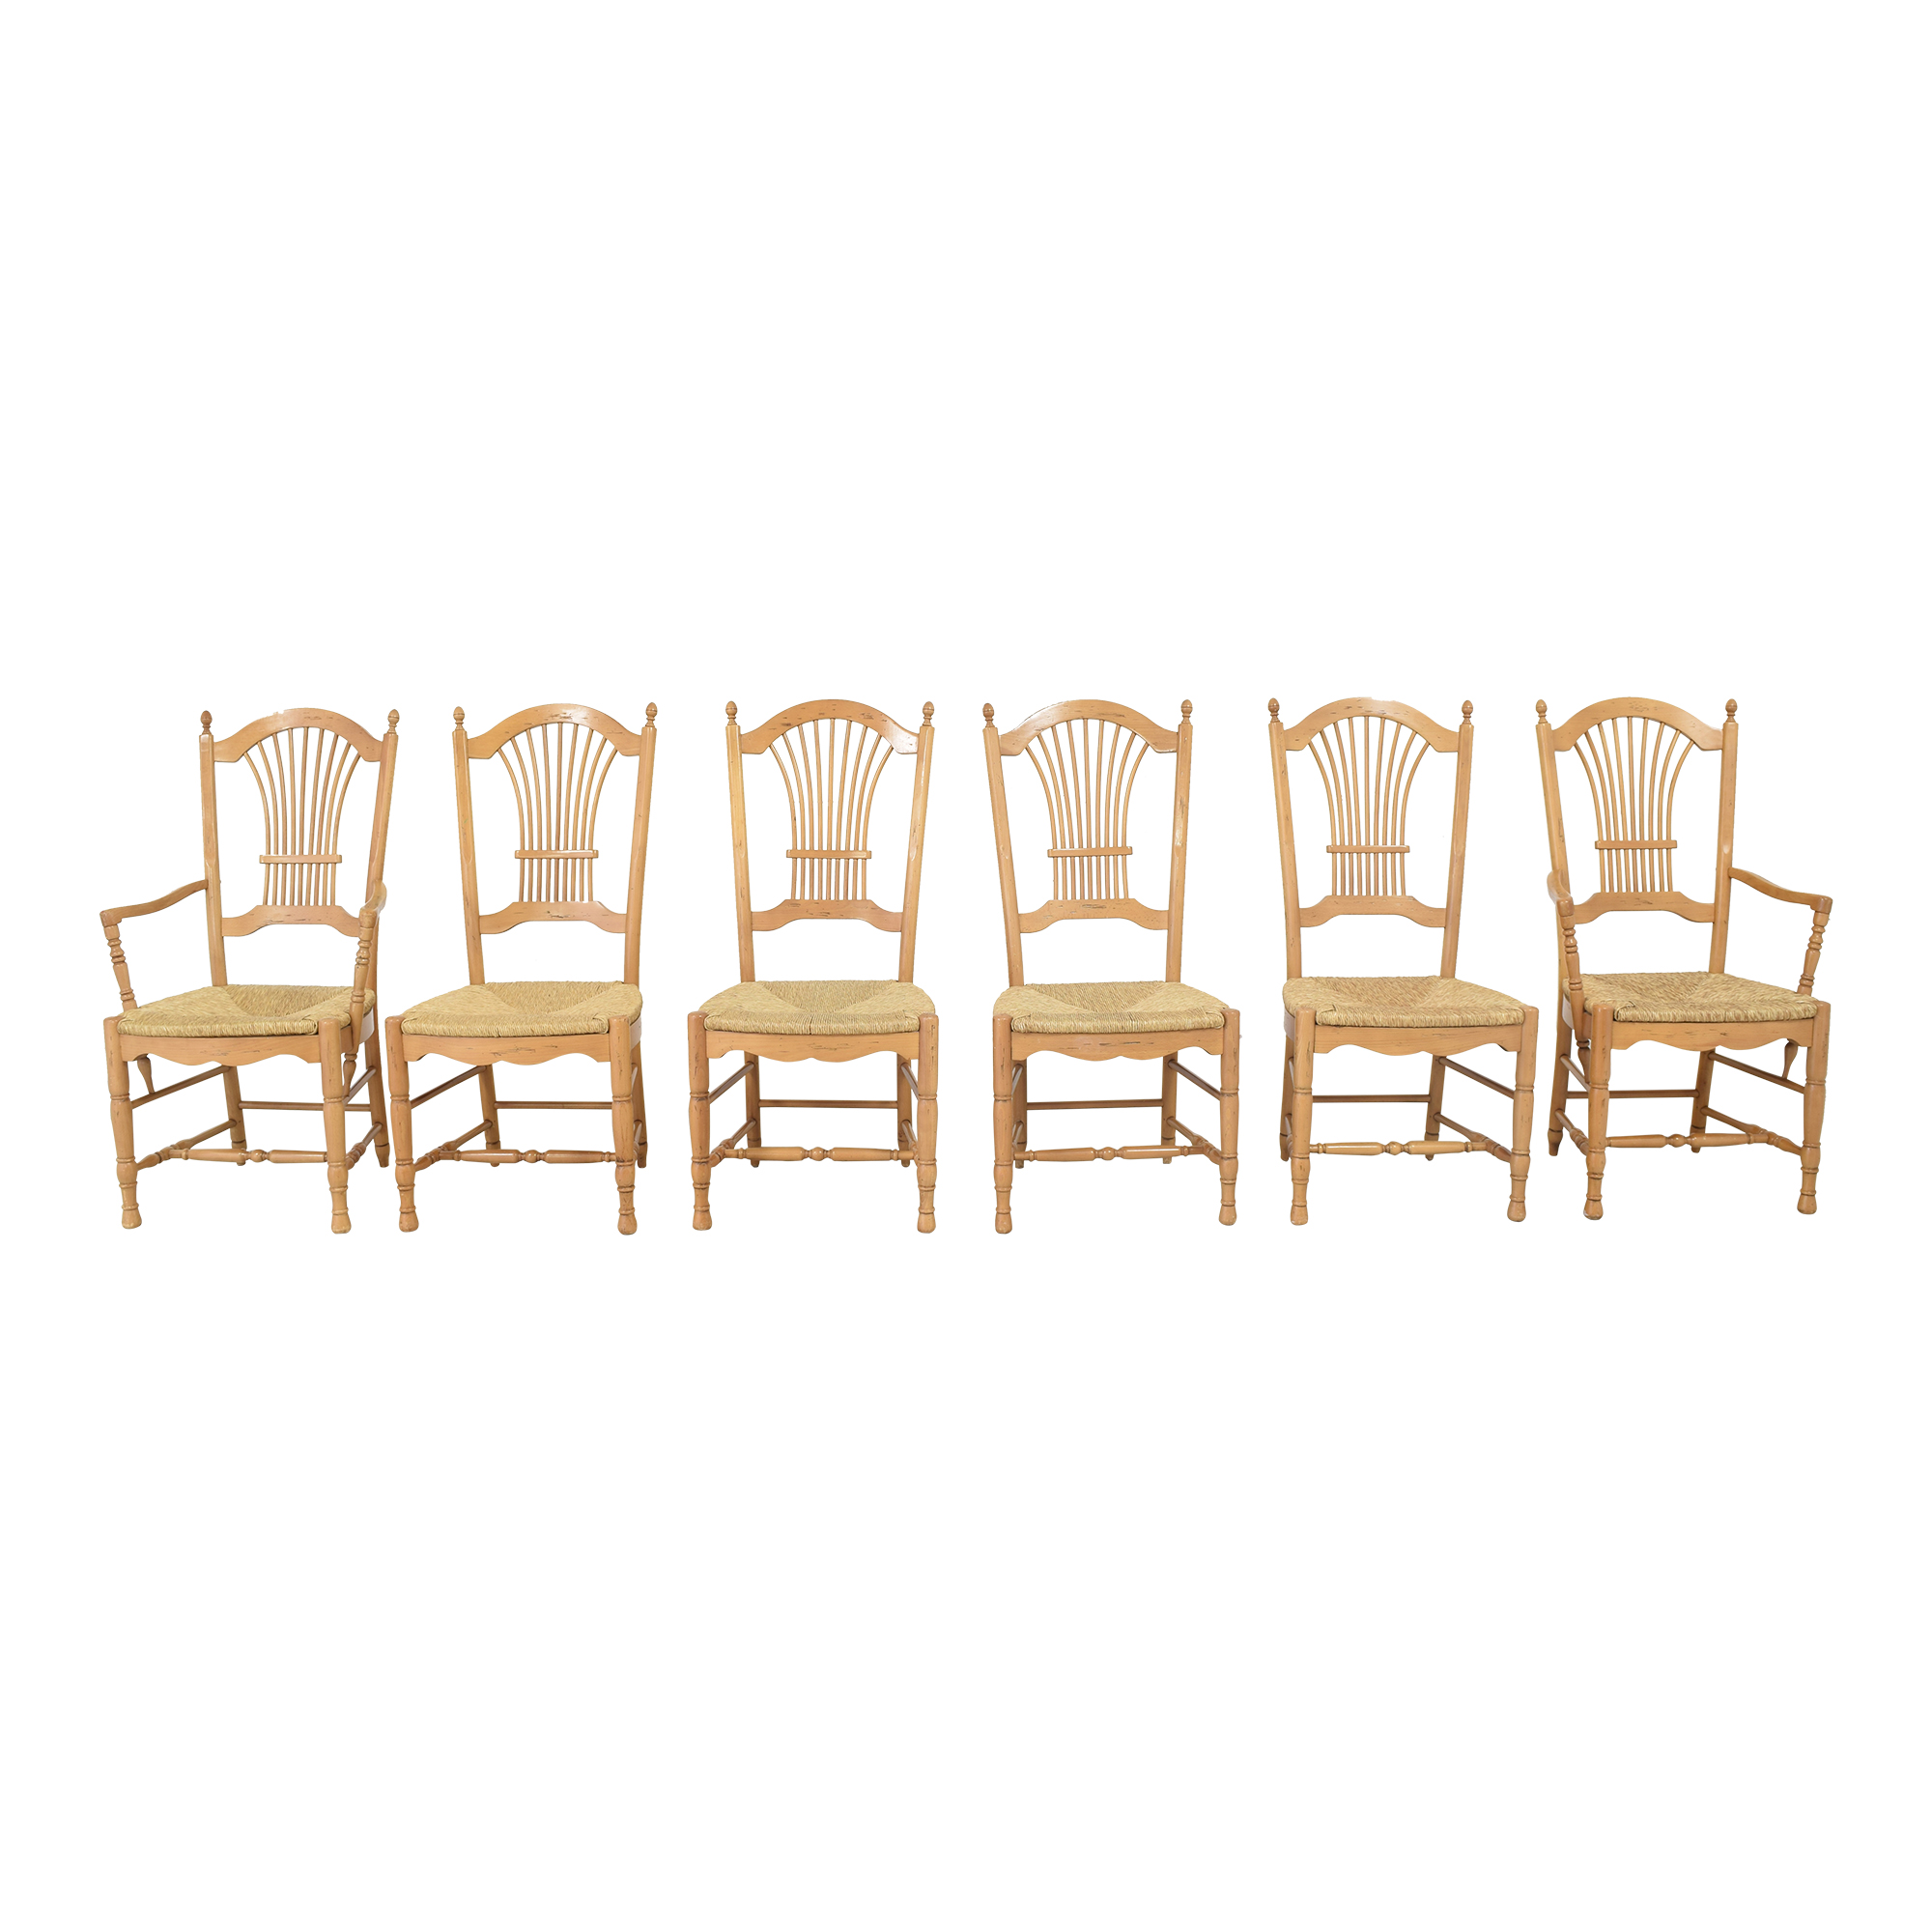 Rumrunner Home Rumrunner Home Sheaf Back Dining Chairs pa